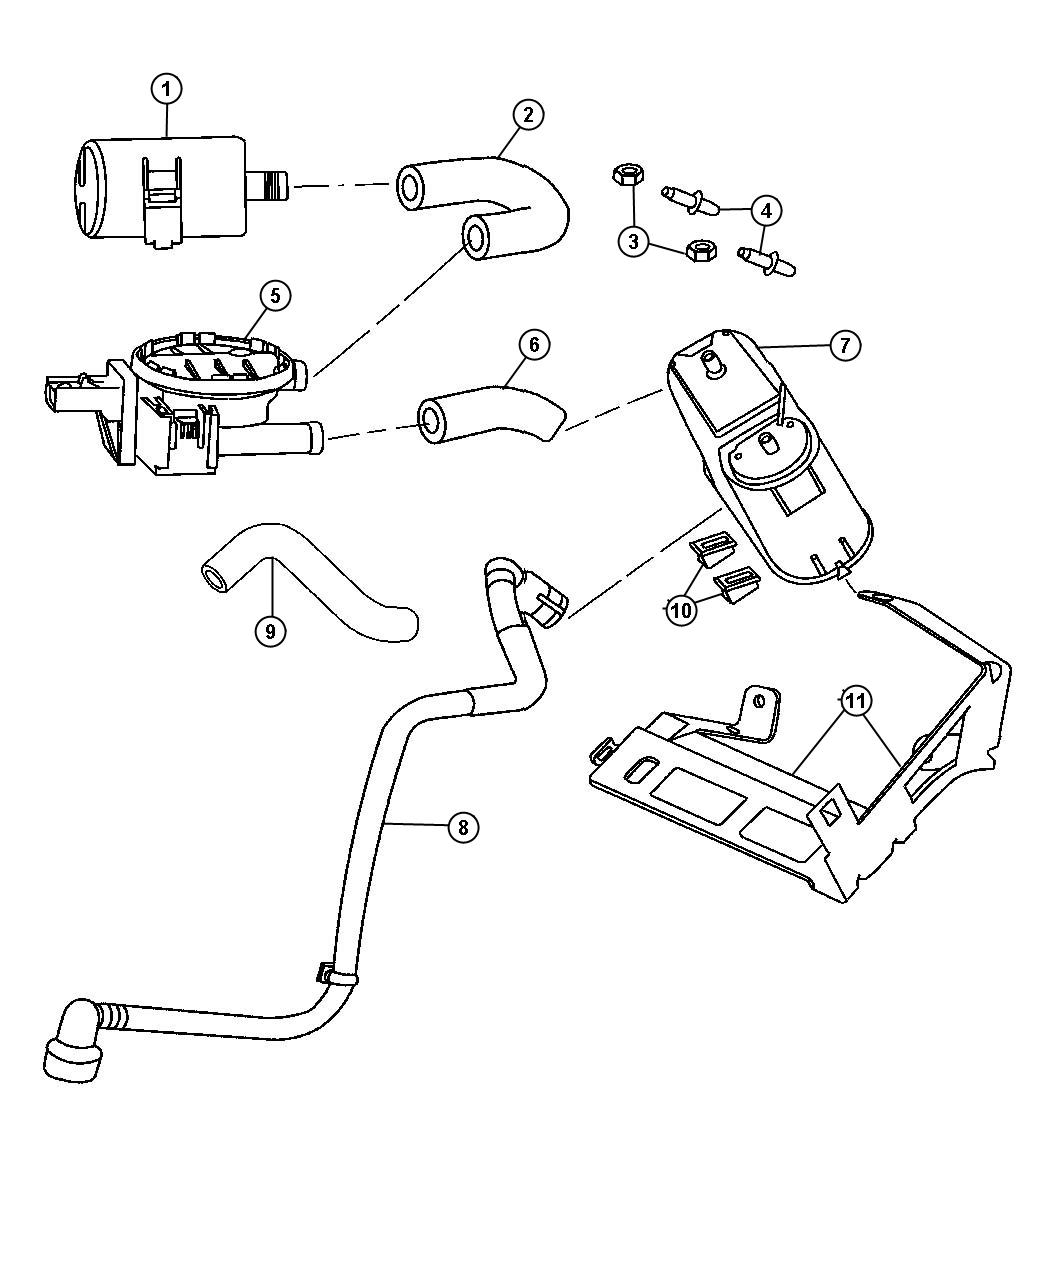 tags: #1998 jeep wrangler vacuum diagram#99 jeep wrangler vacuum diagram#jeep  vacuum schematic#1995 jeep wrangler vacuum diagram#turbo vacuum diagram#1988